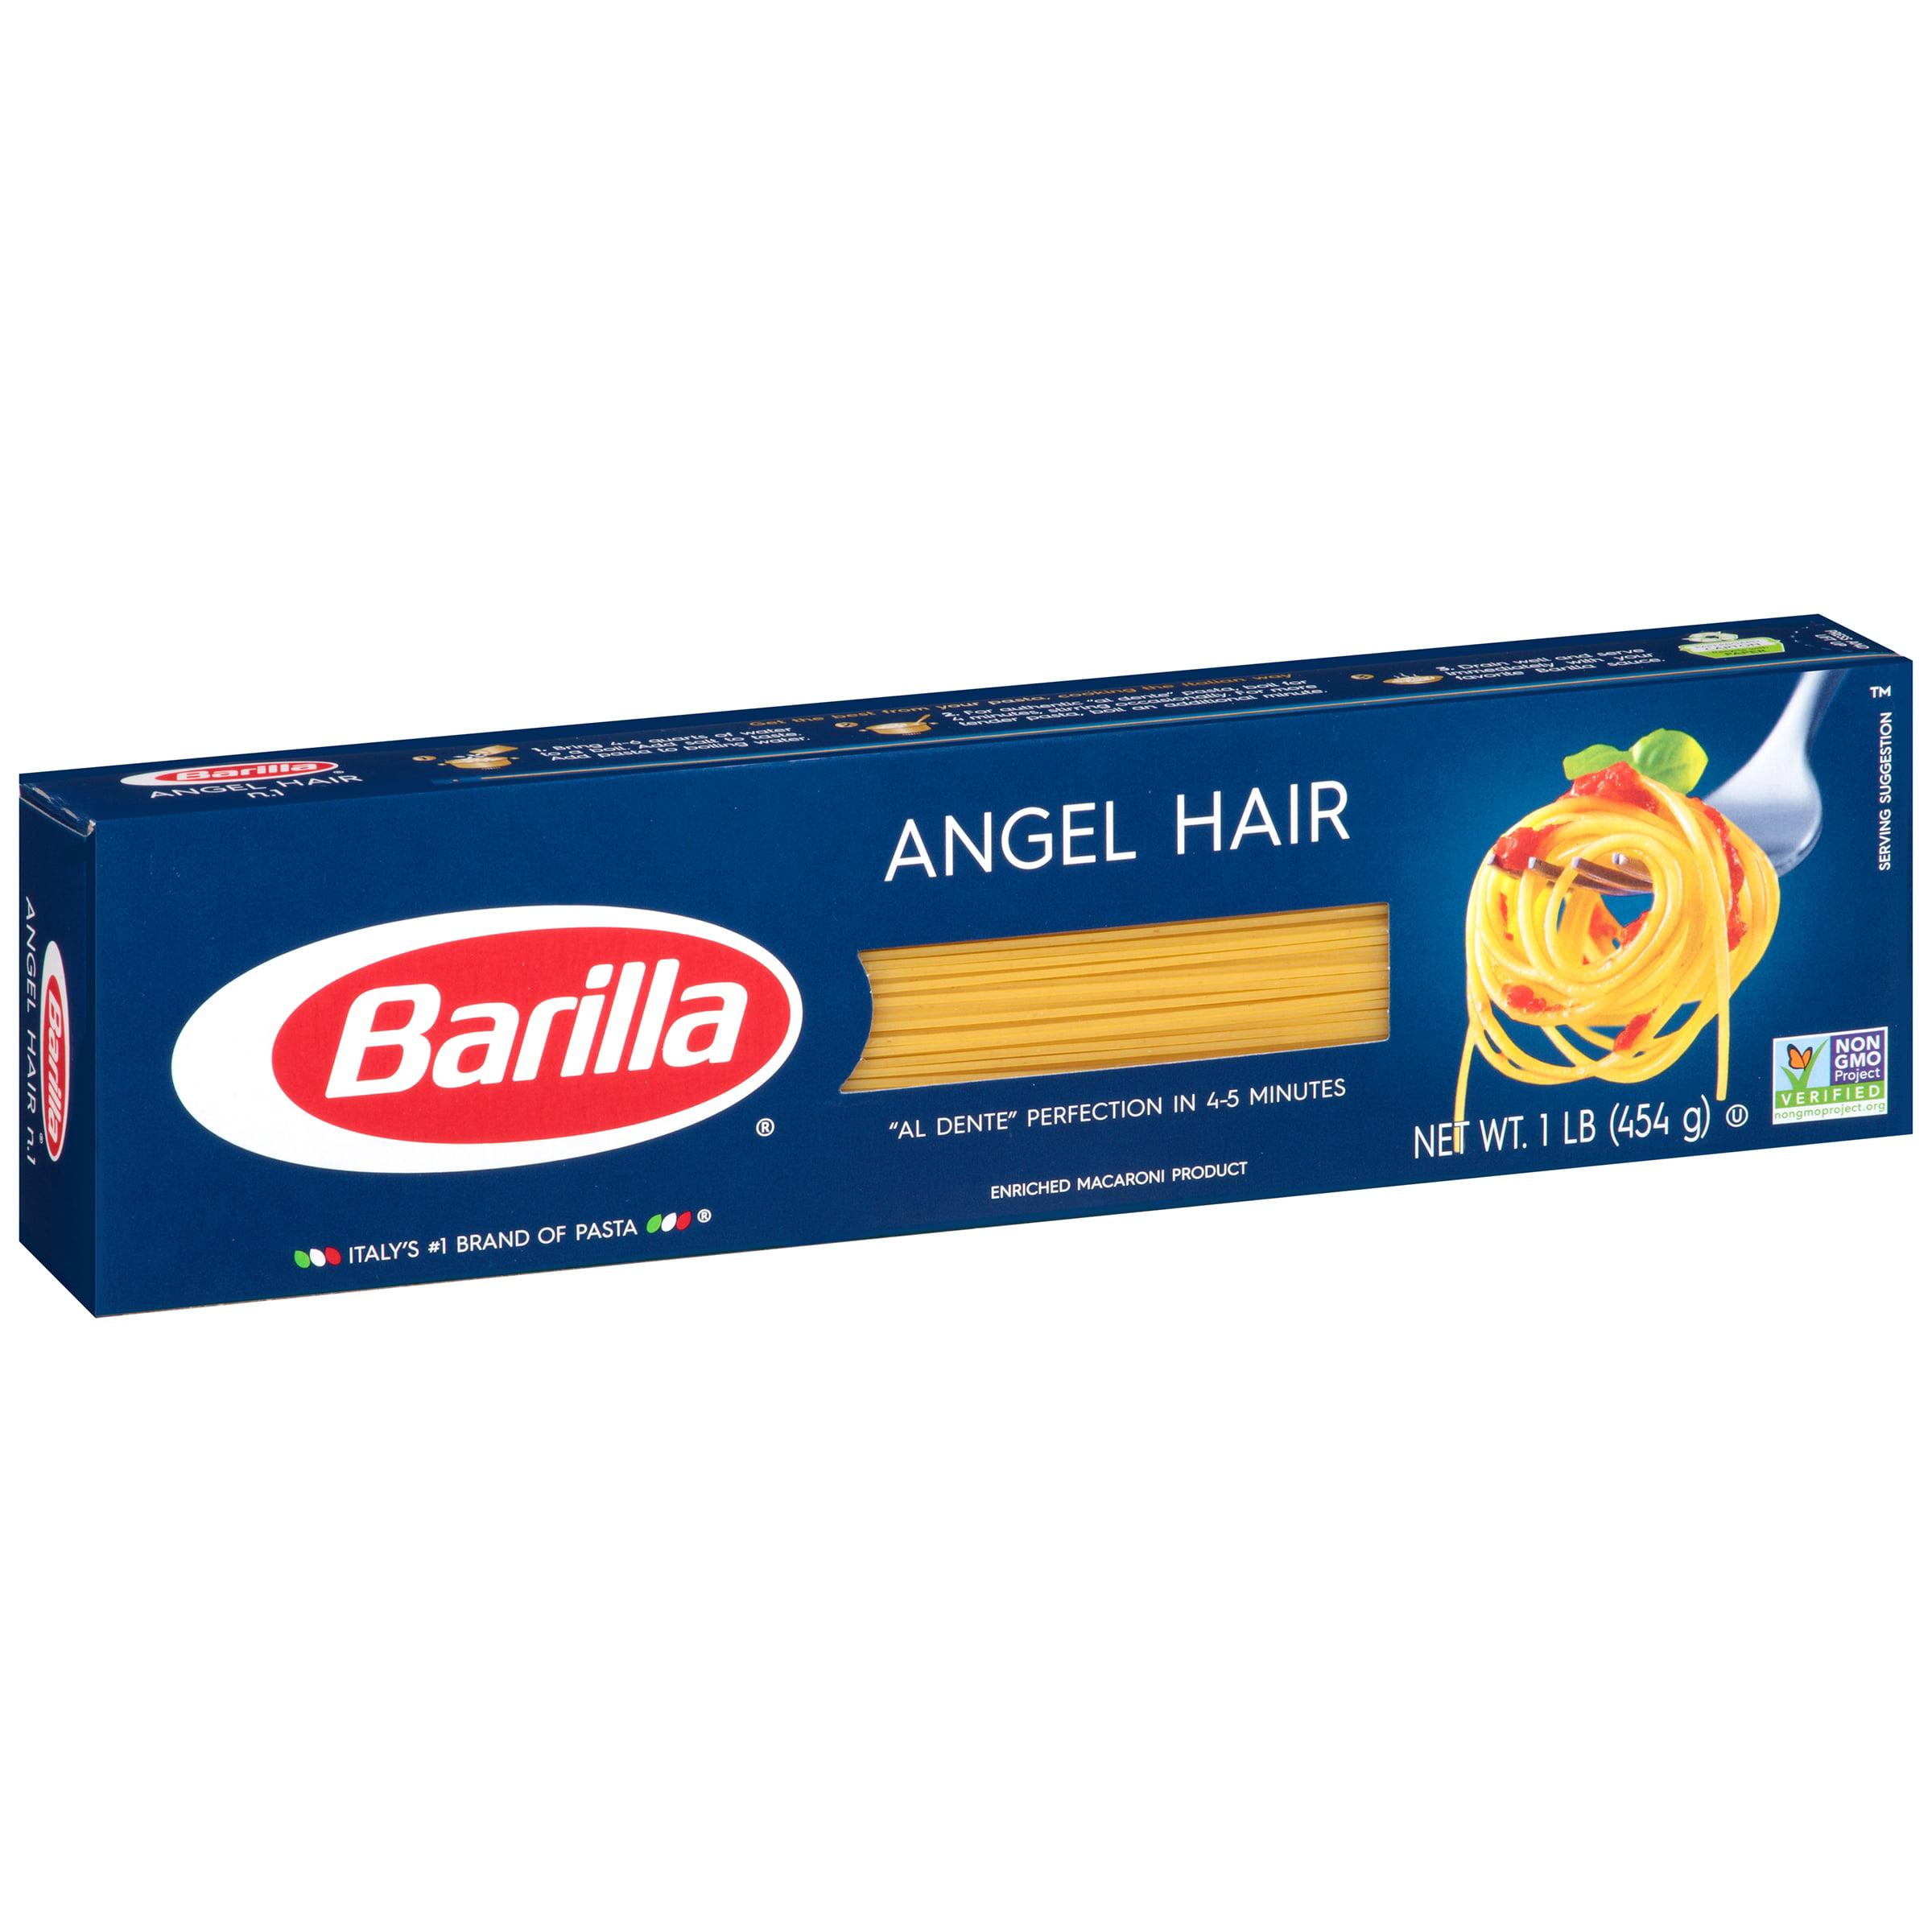 Barilla Pasta Angel Hair, 16.0 OZ by Barilla America, Inc.